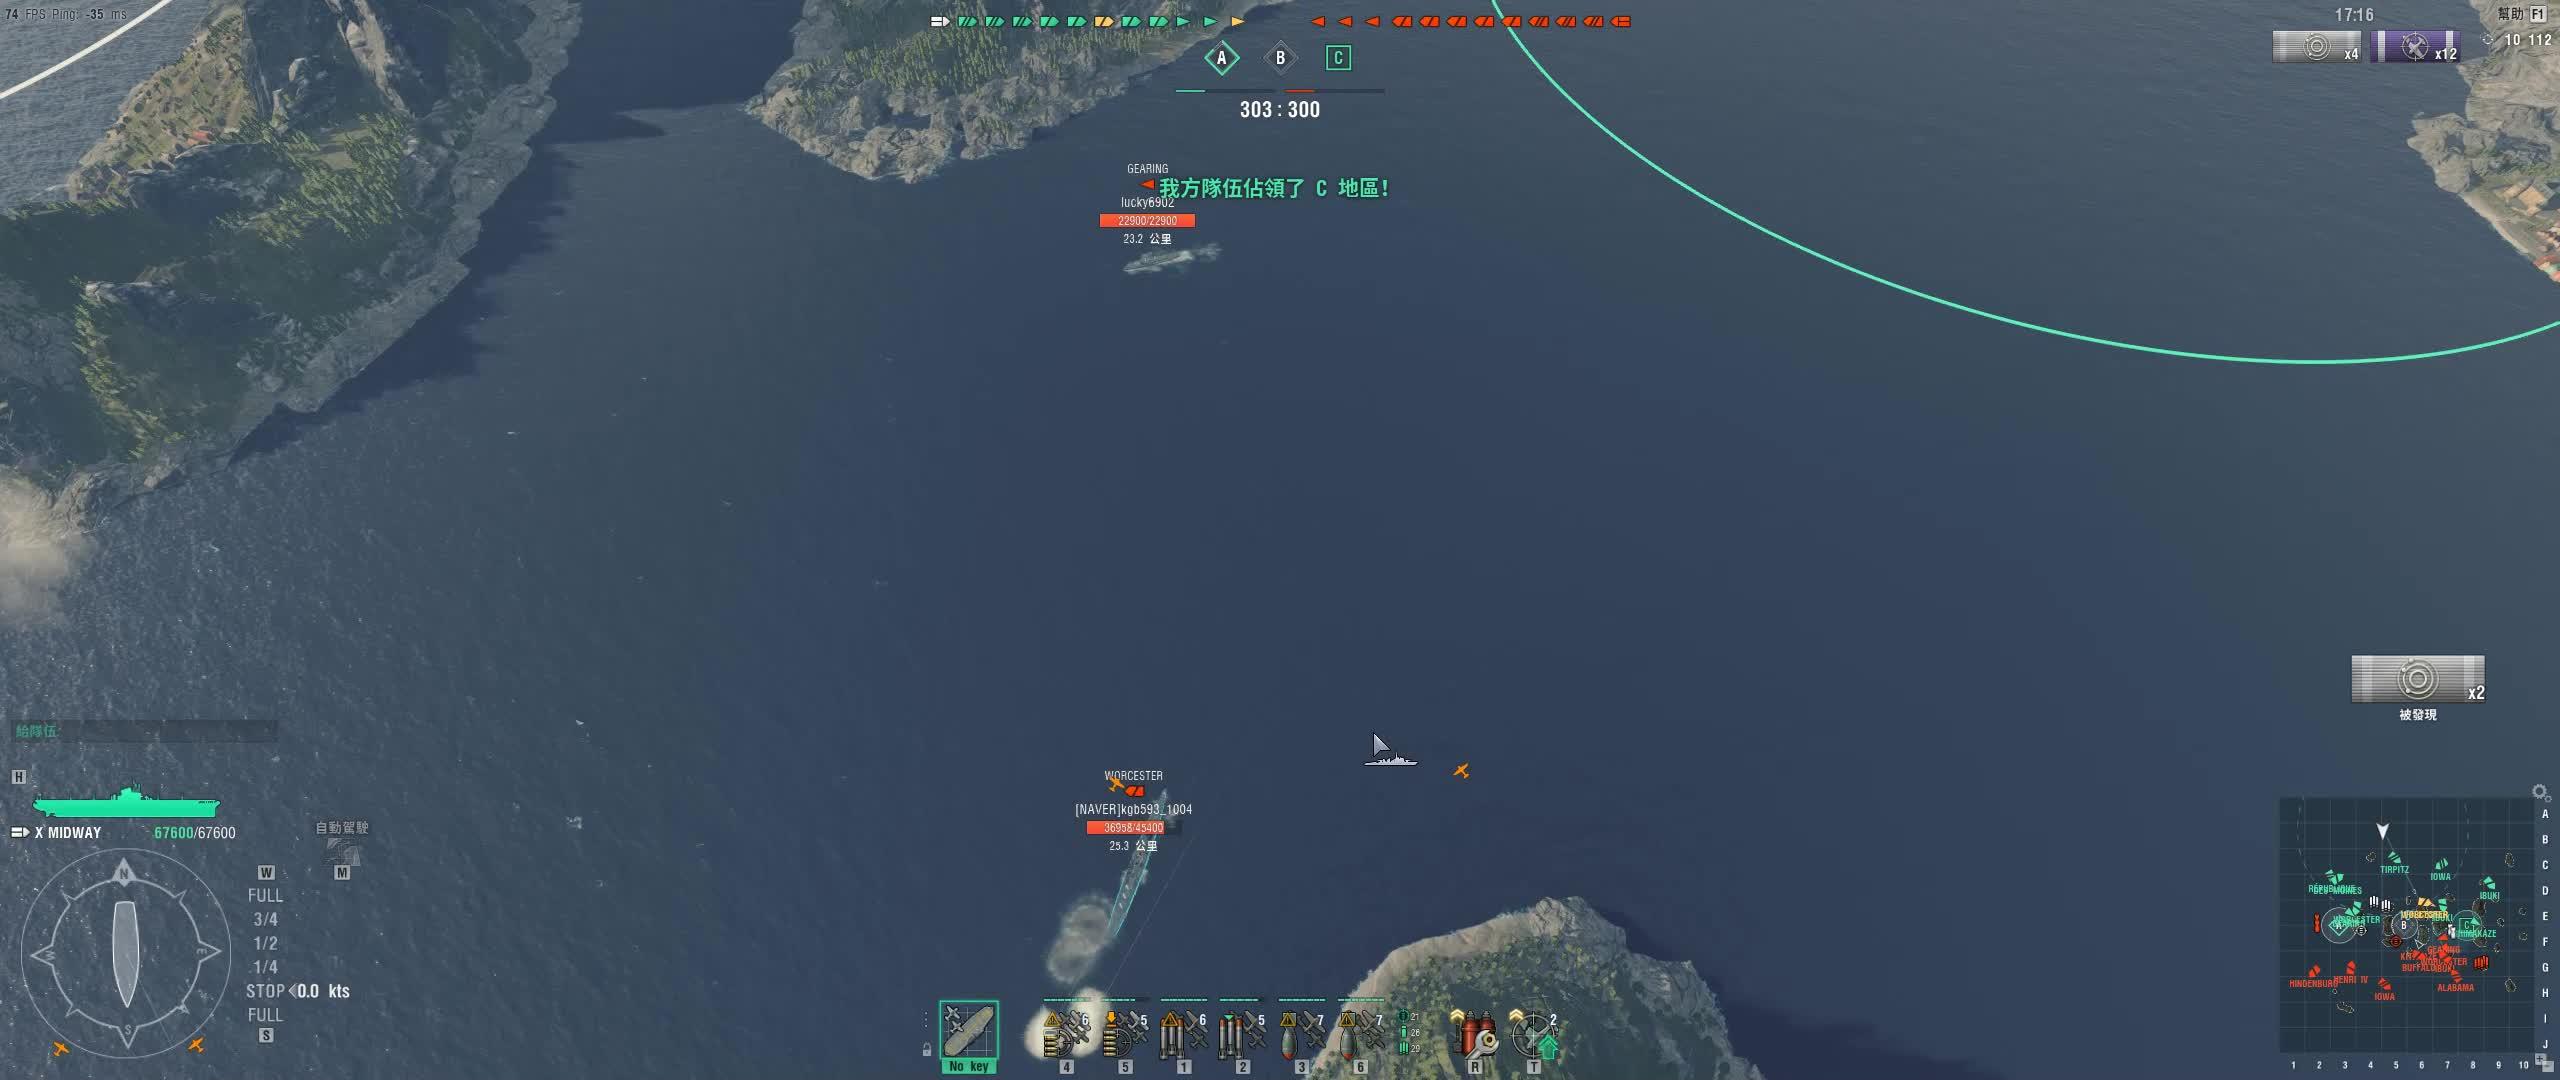 worldofwarships, World of Warships 2018.12.12 - 13.26.59.01 GIFs